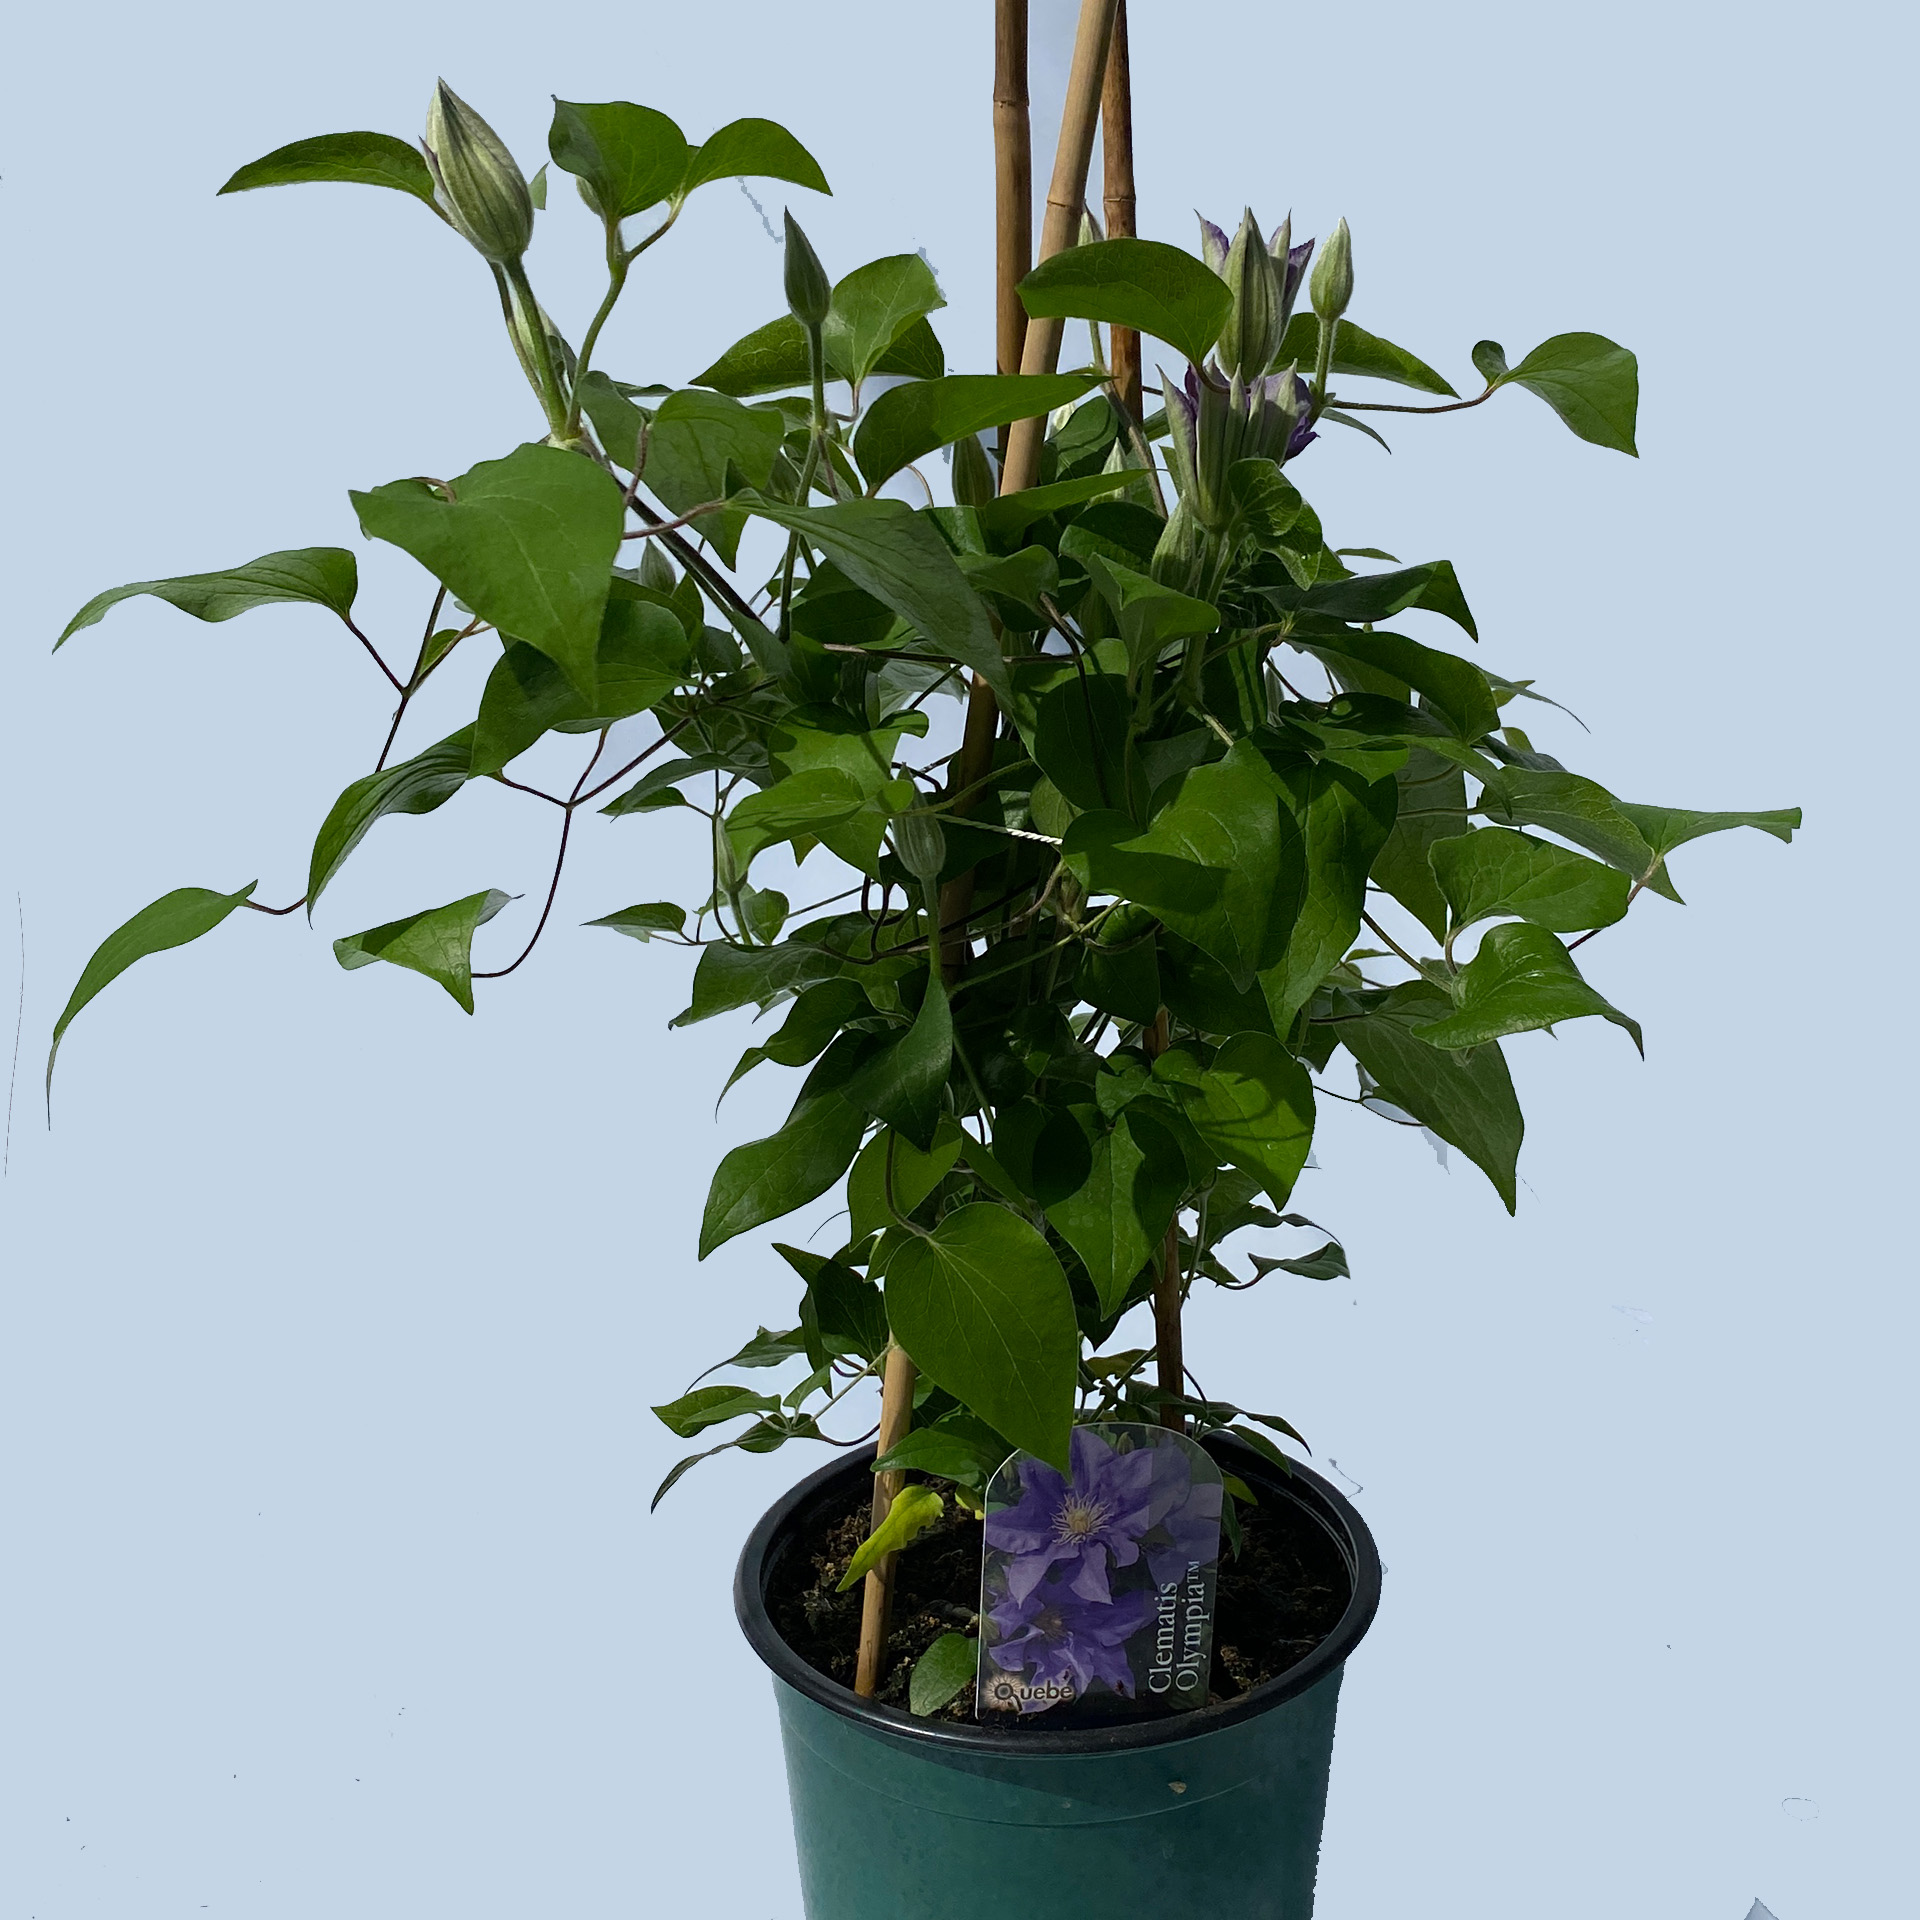 Clematis / Waldrebe 'Olympia Milka' lila, 19cm Topf